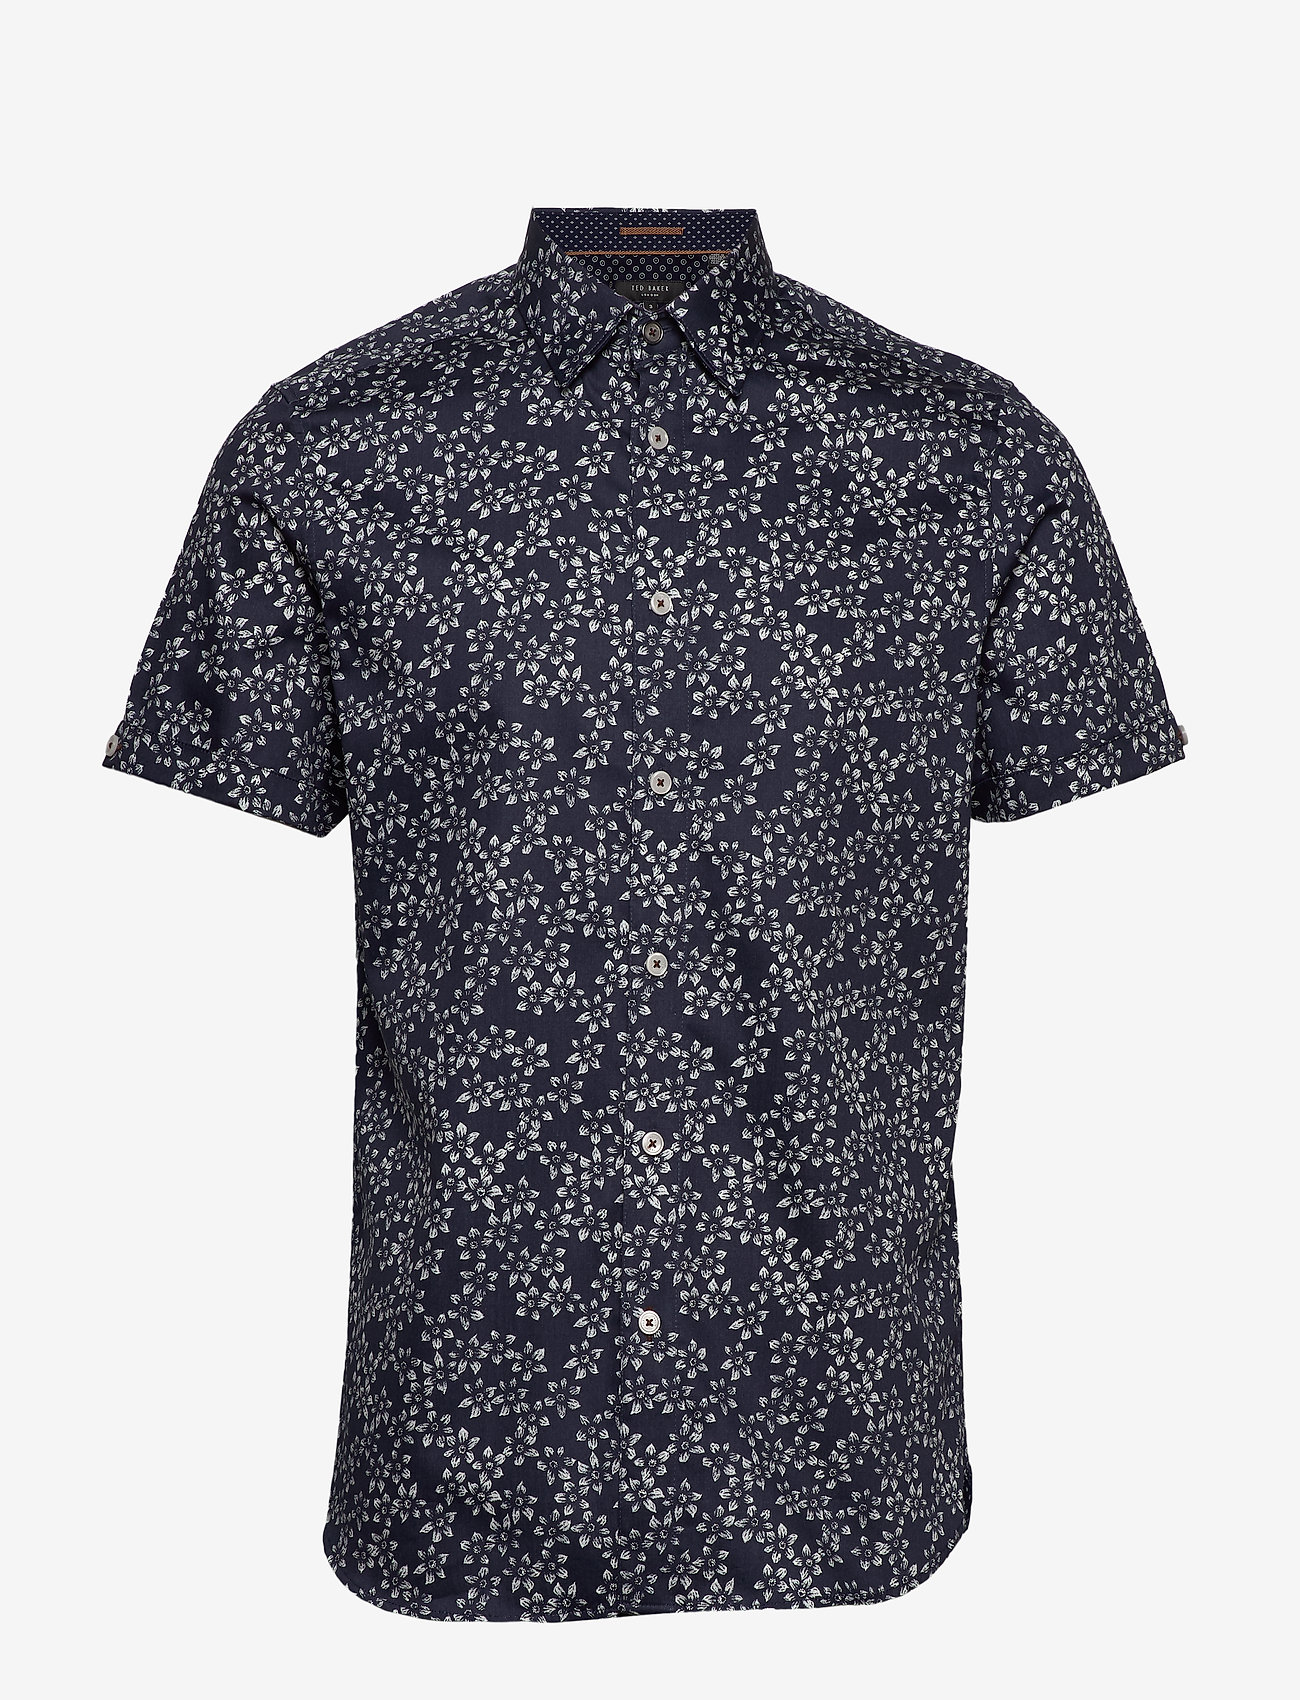 Ted Baker - YEPYEP - short-sleeved shirts - navy